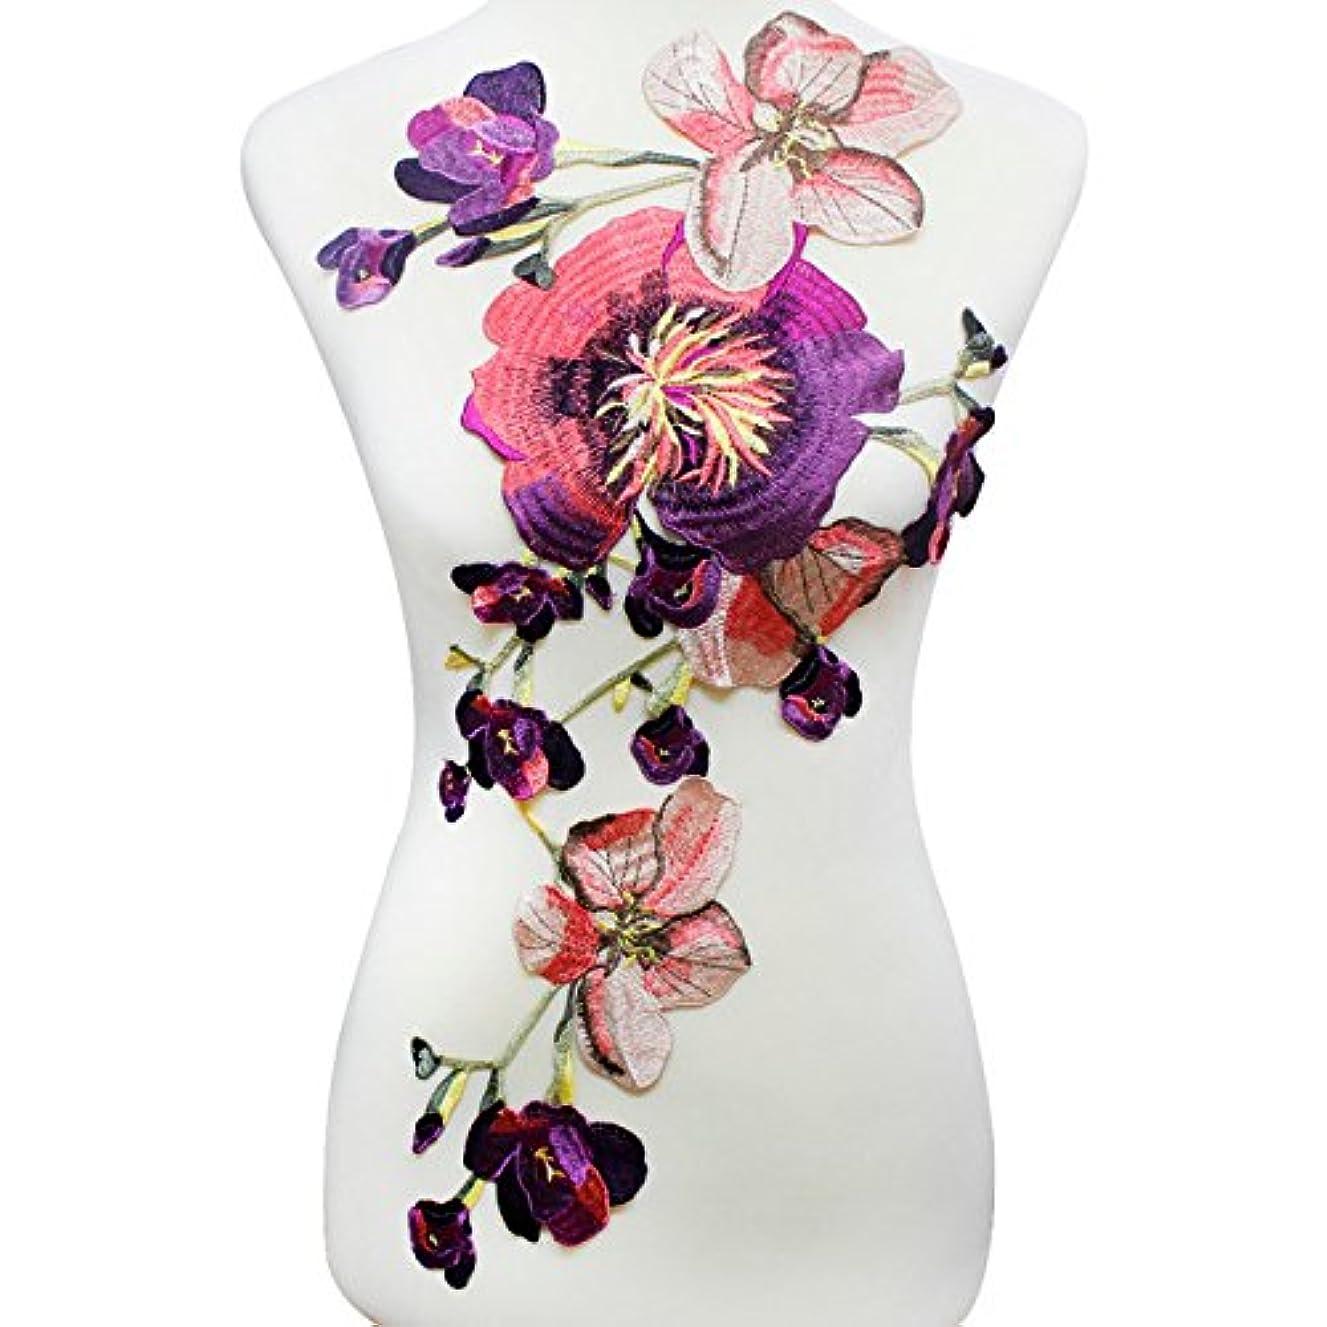 Resources House Multicolor Long Floral Patch Embroidery Applique Flower Patch Lace Fabric Motif Applique Sew On Patches